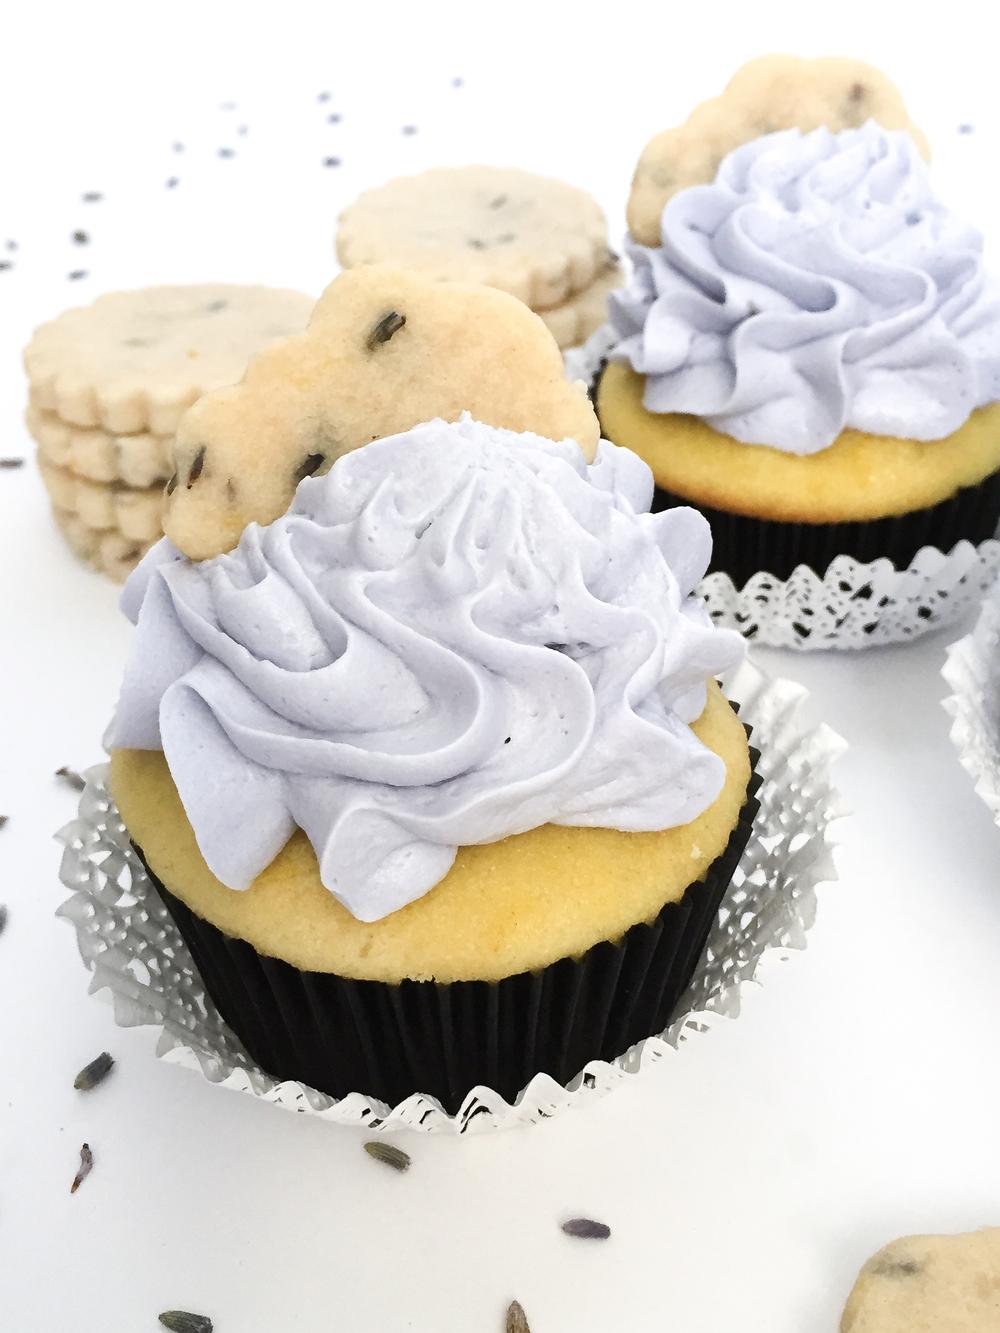 Lemon lavender cupcakes with fresh lemon curd